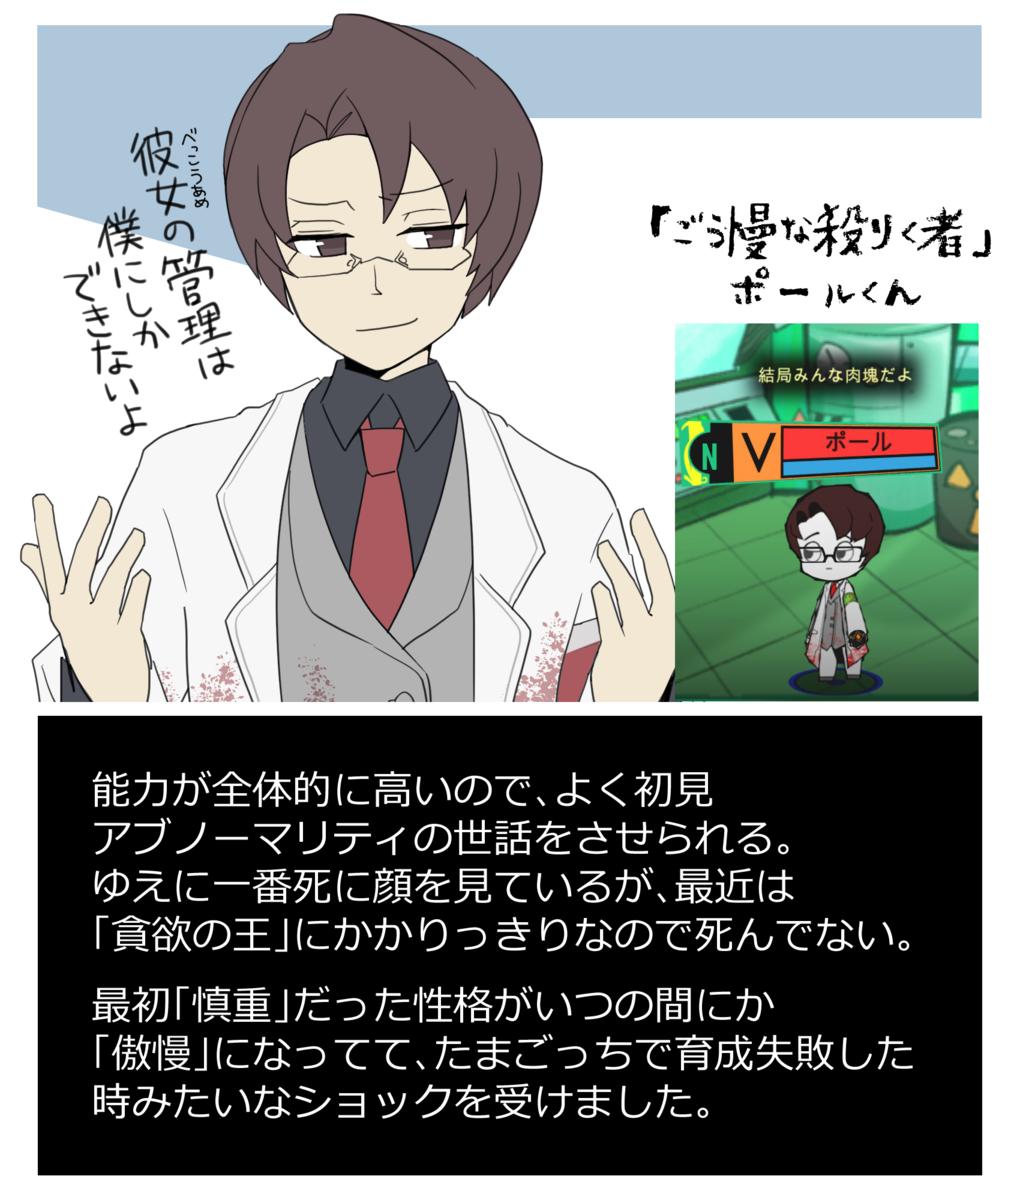 f:id:nantekotodesyoune_segawa:20190515140217p:plain